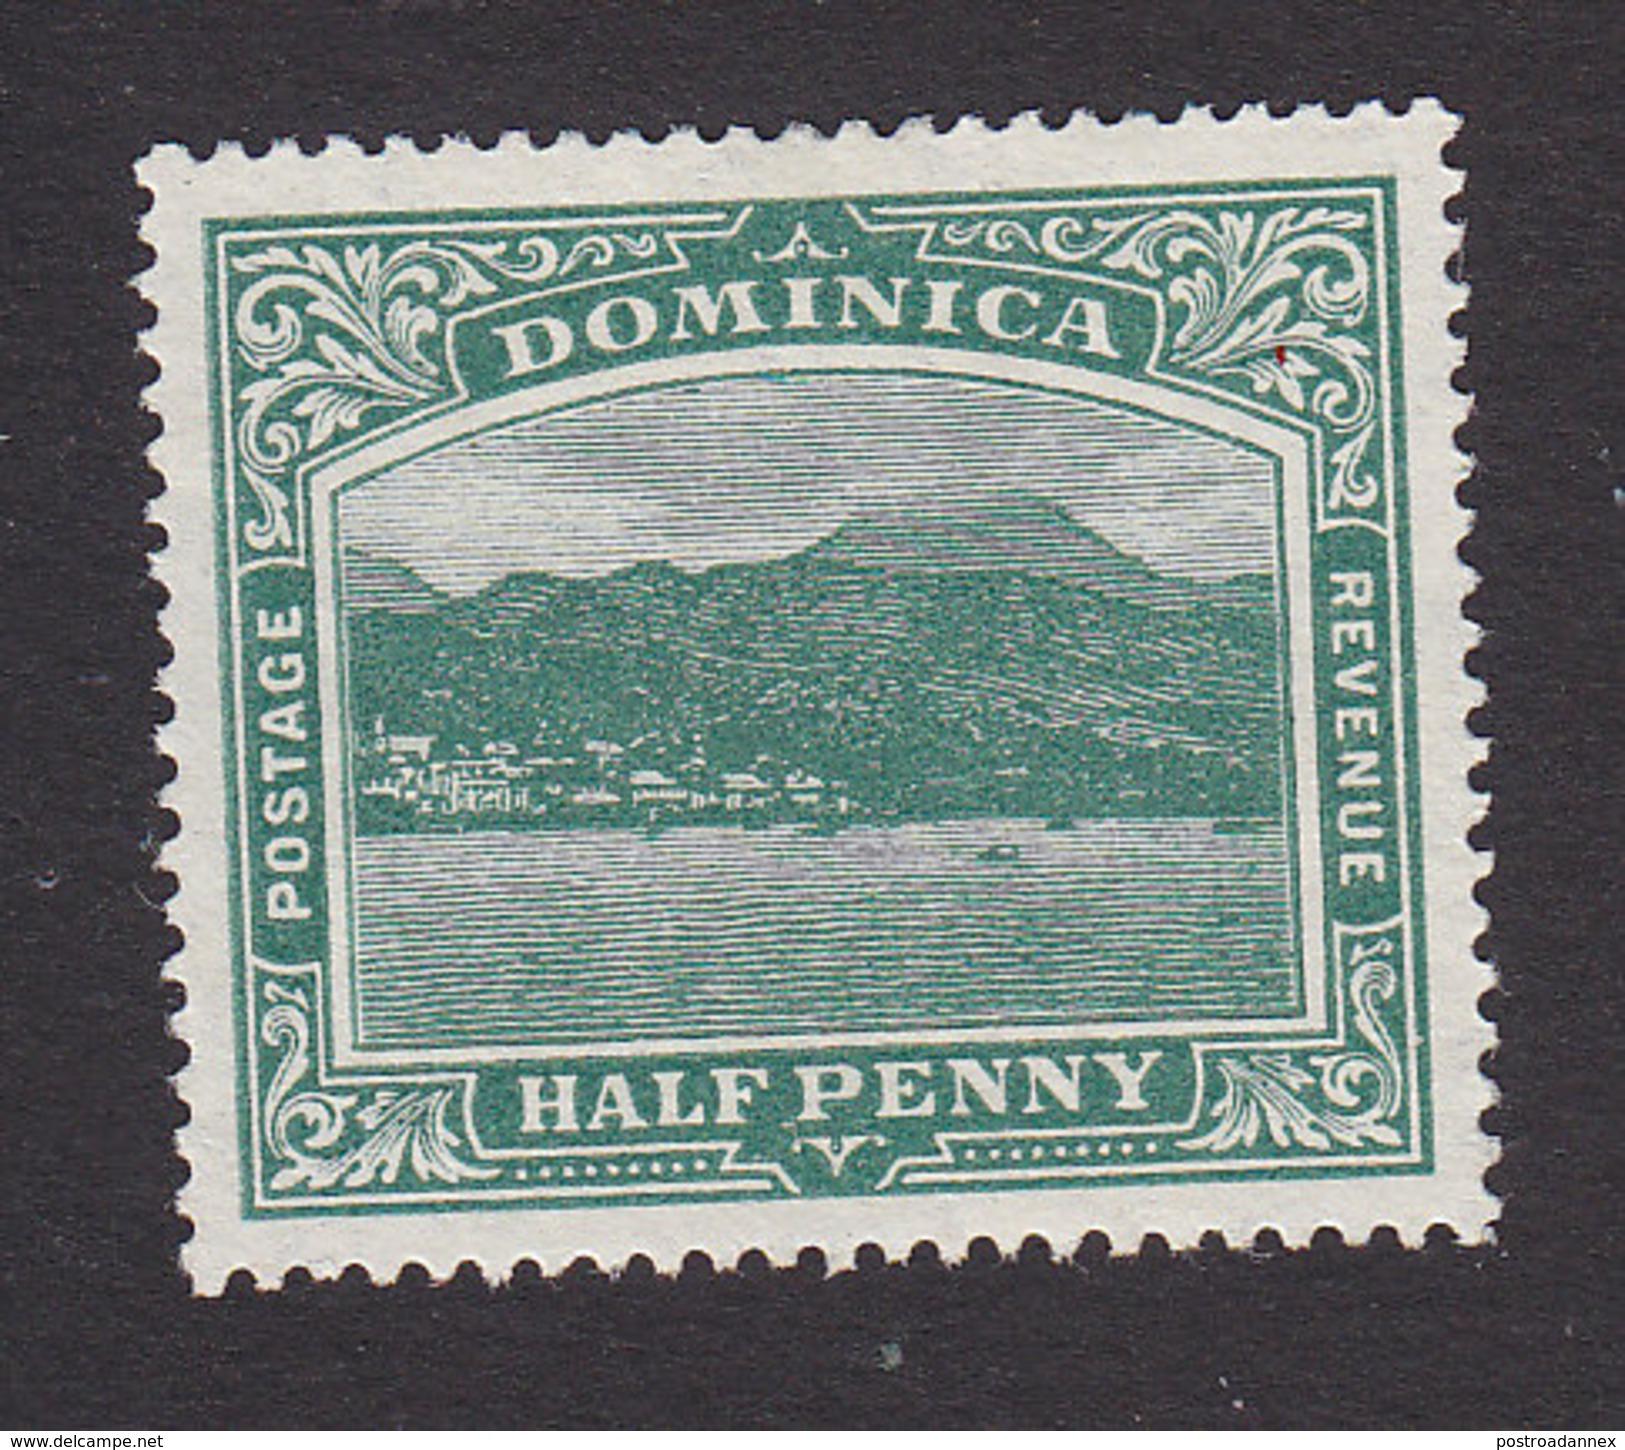 Dominica, Scott #50, Mint No Gum, Roseau Capital Of Dominica, Issued 1908 - Dominique (...-1978)